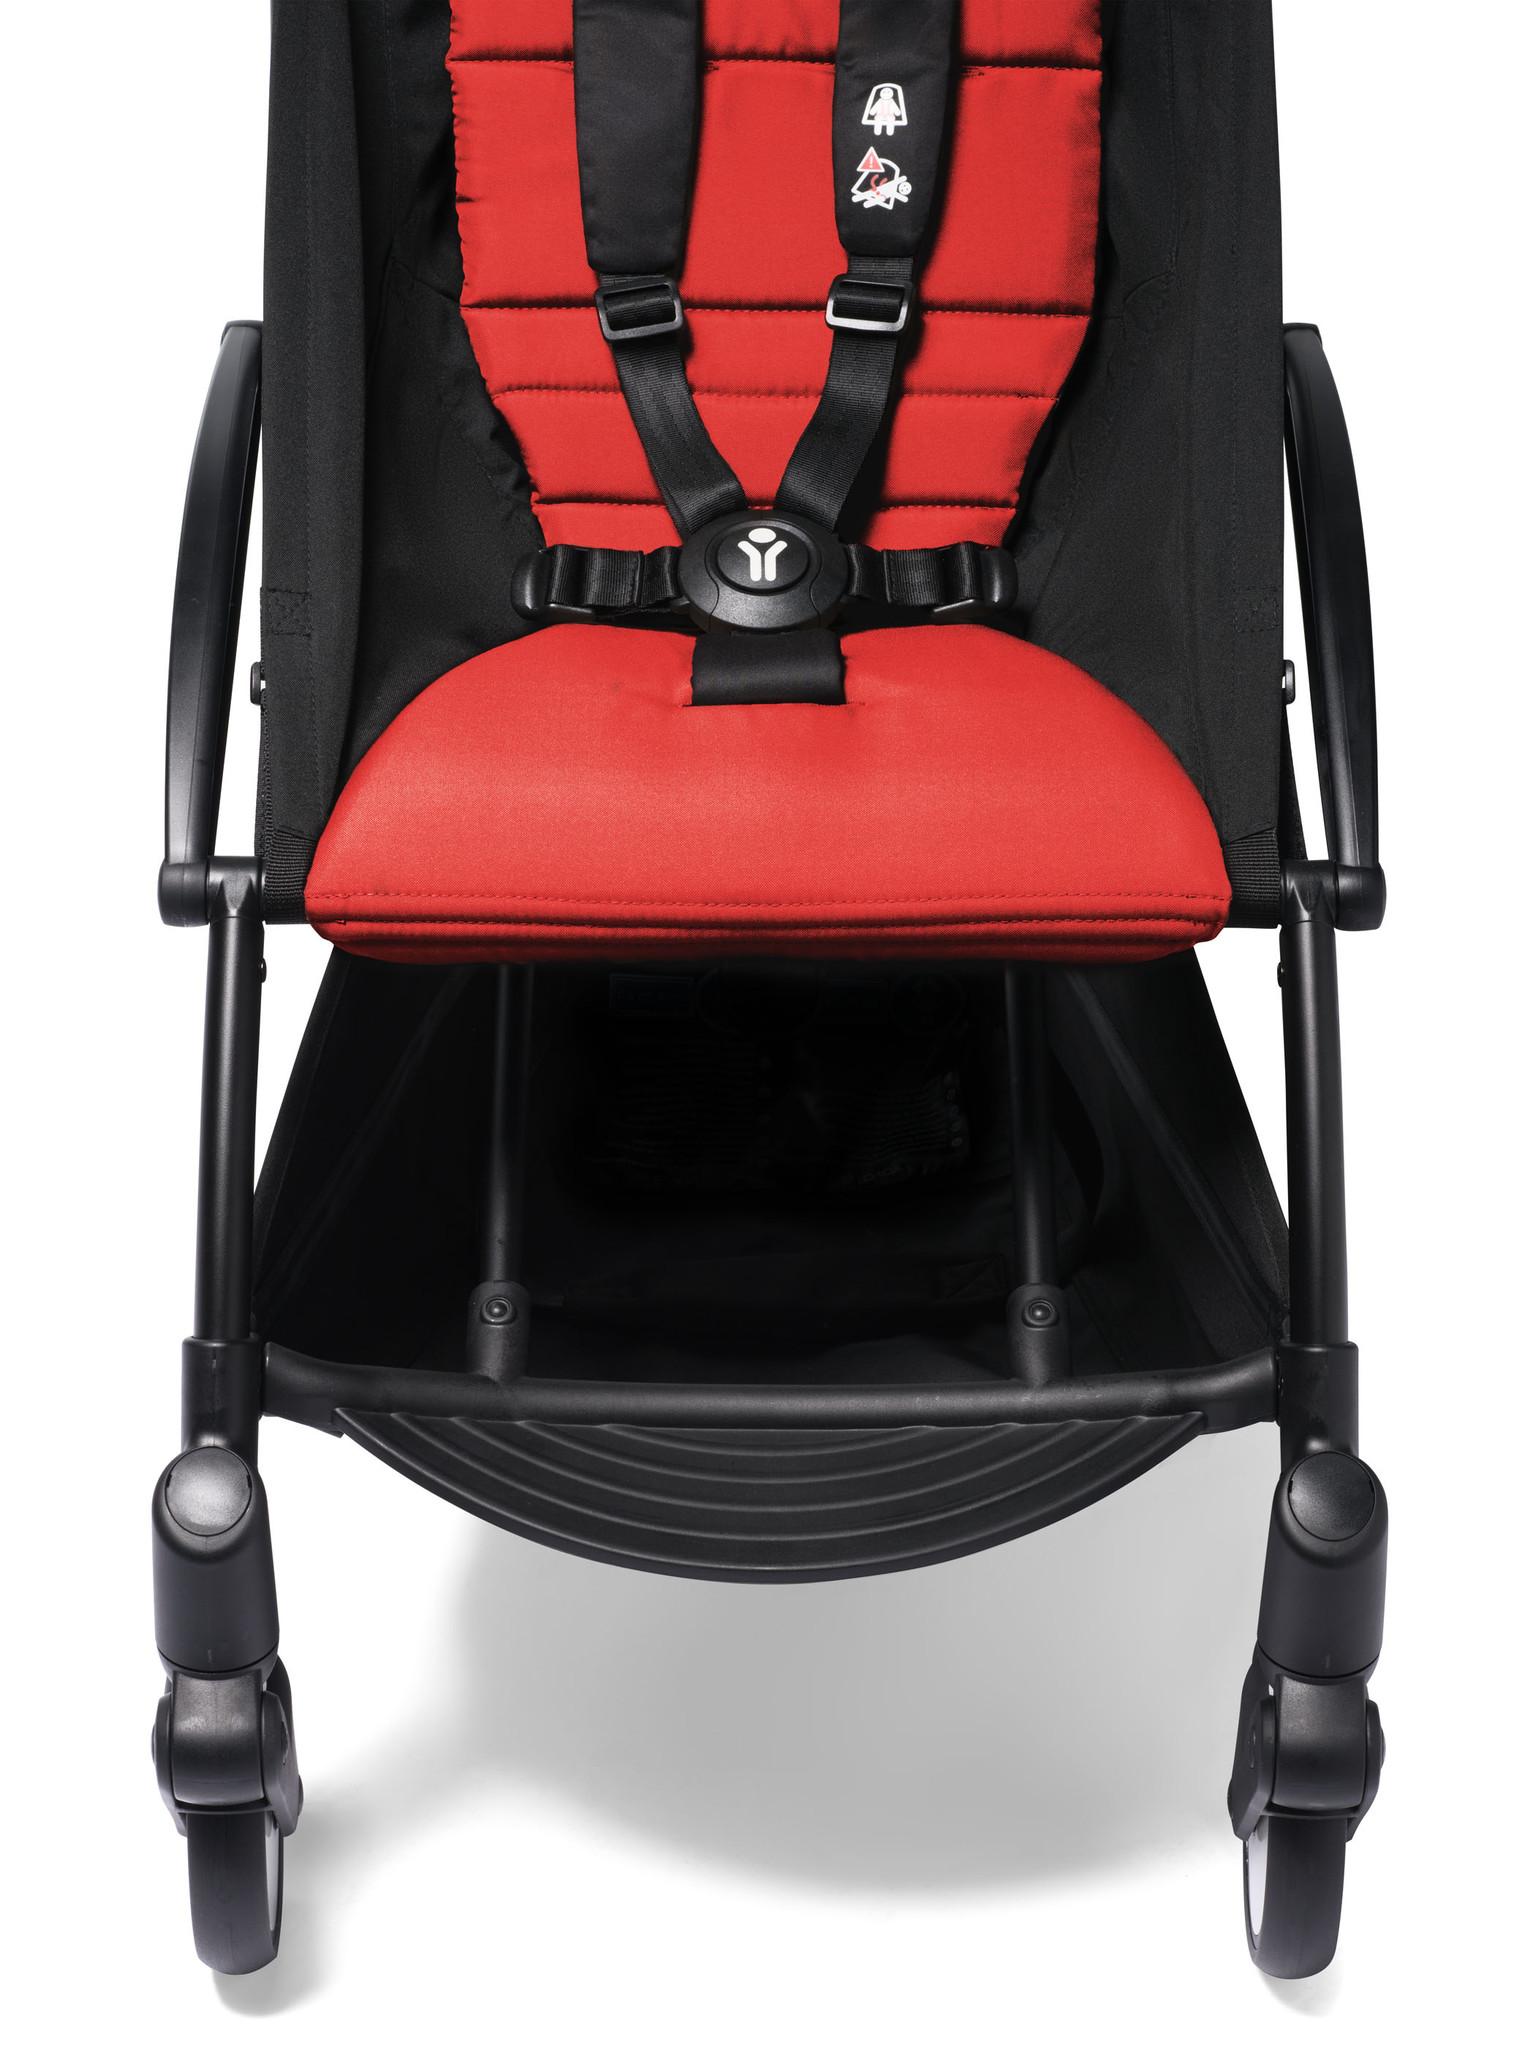 Babyzen Babyzen YOYO² buggy COMPLEET / FULL SET 0+ and 6+ rood frame wit